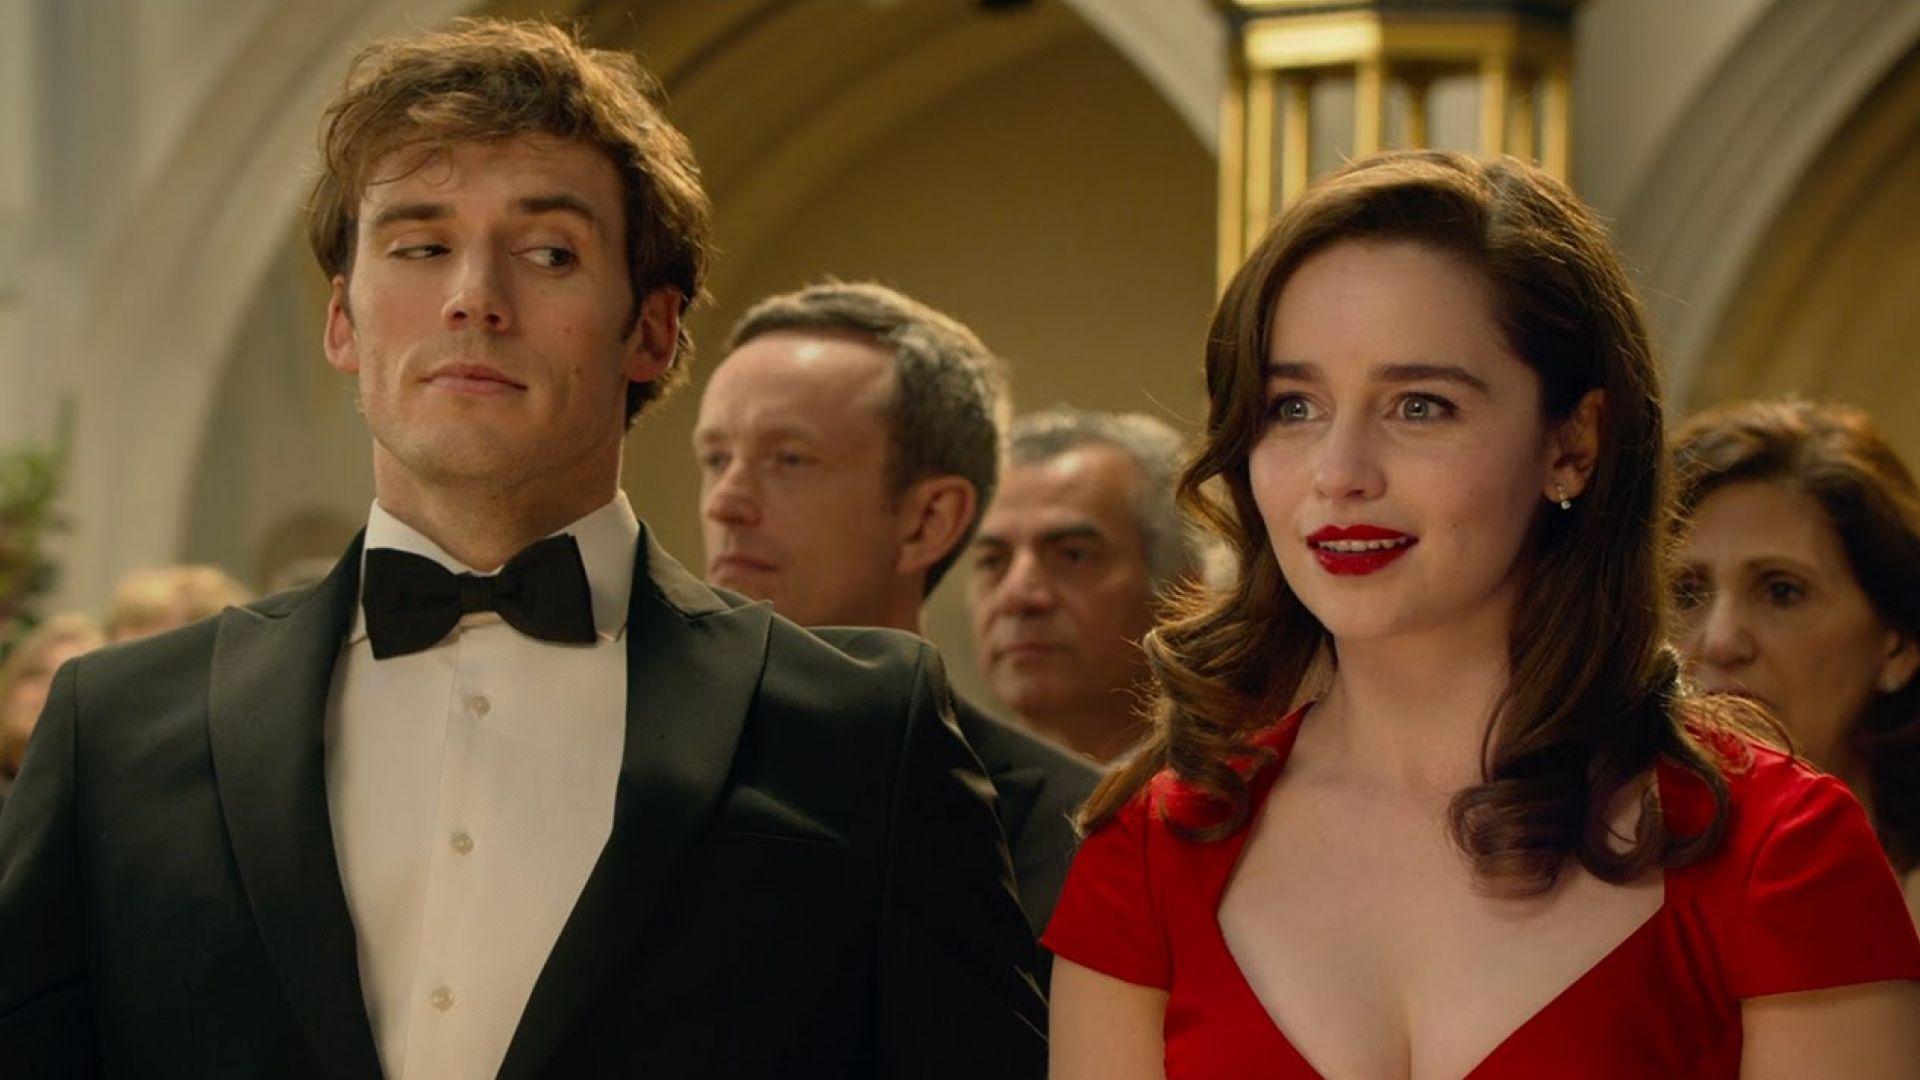 Emilia Clarke and Sam Claflin in 'Me Before You'. Drama base